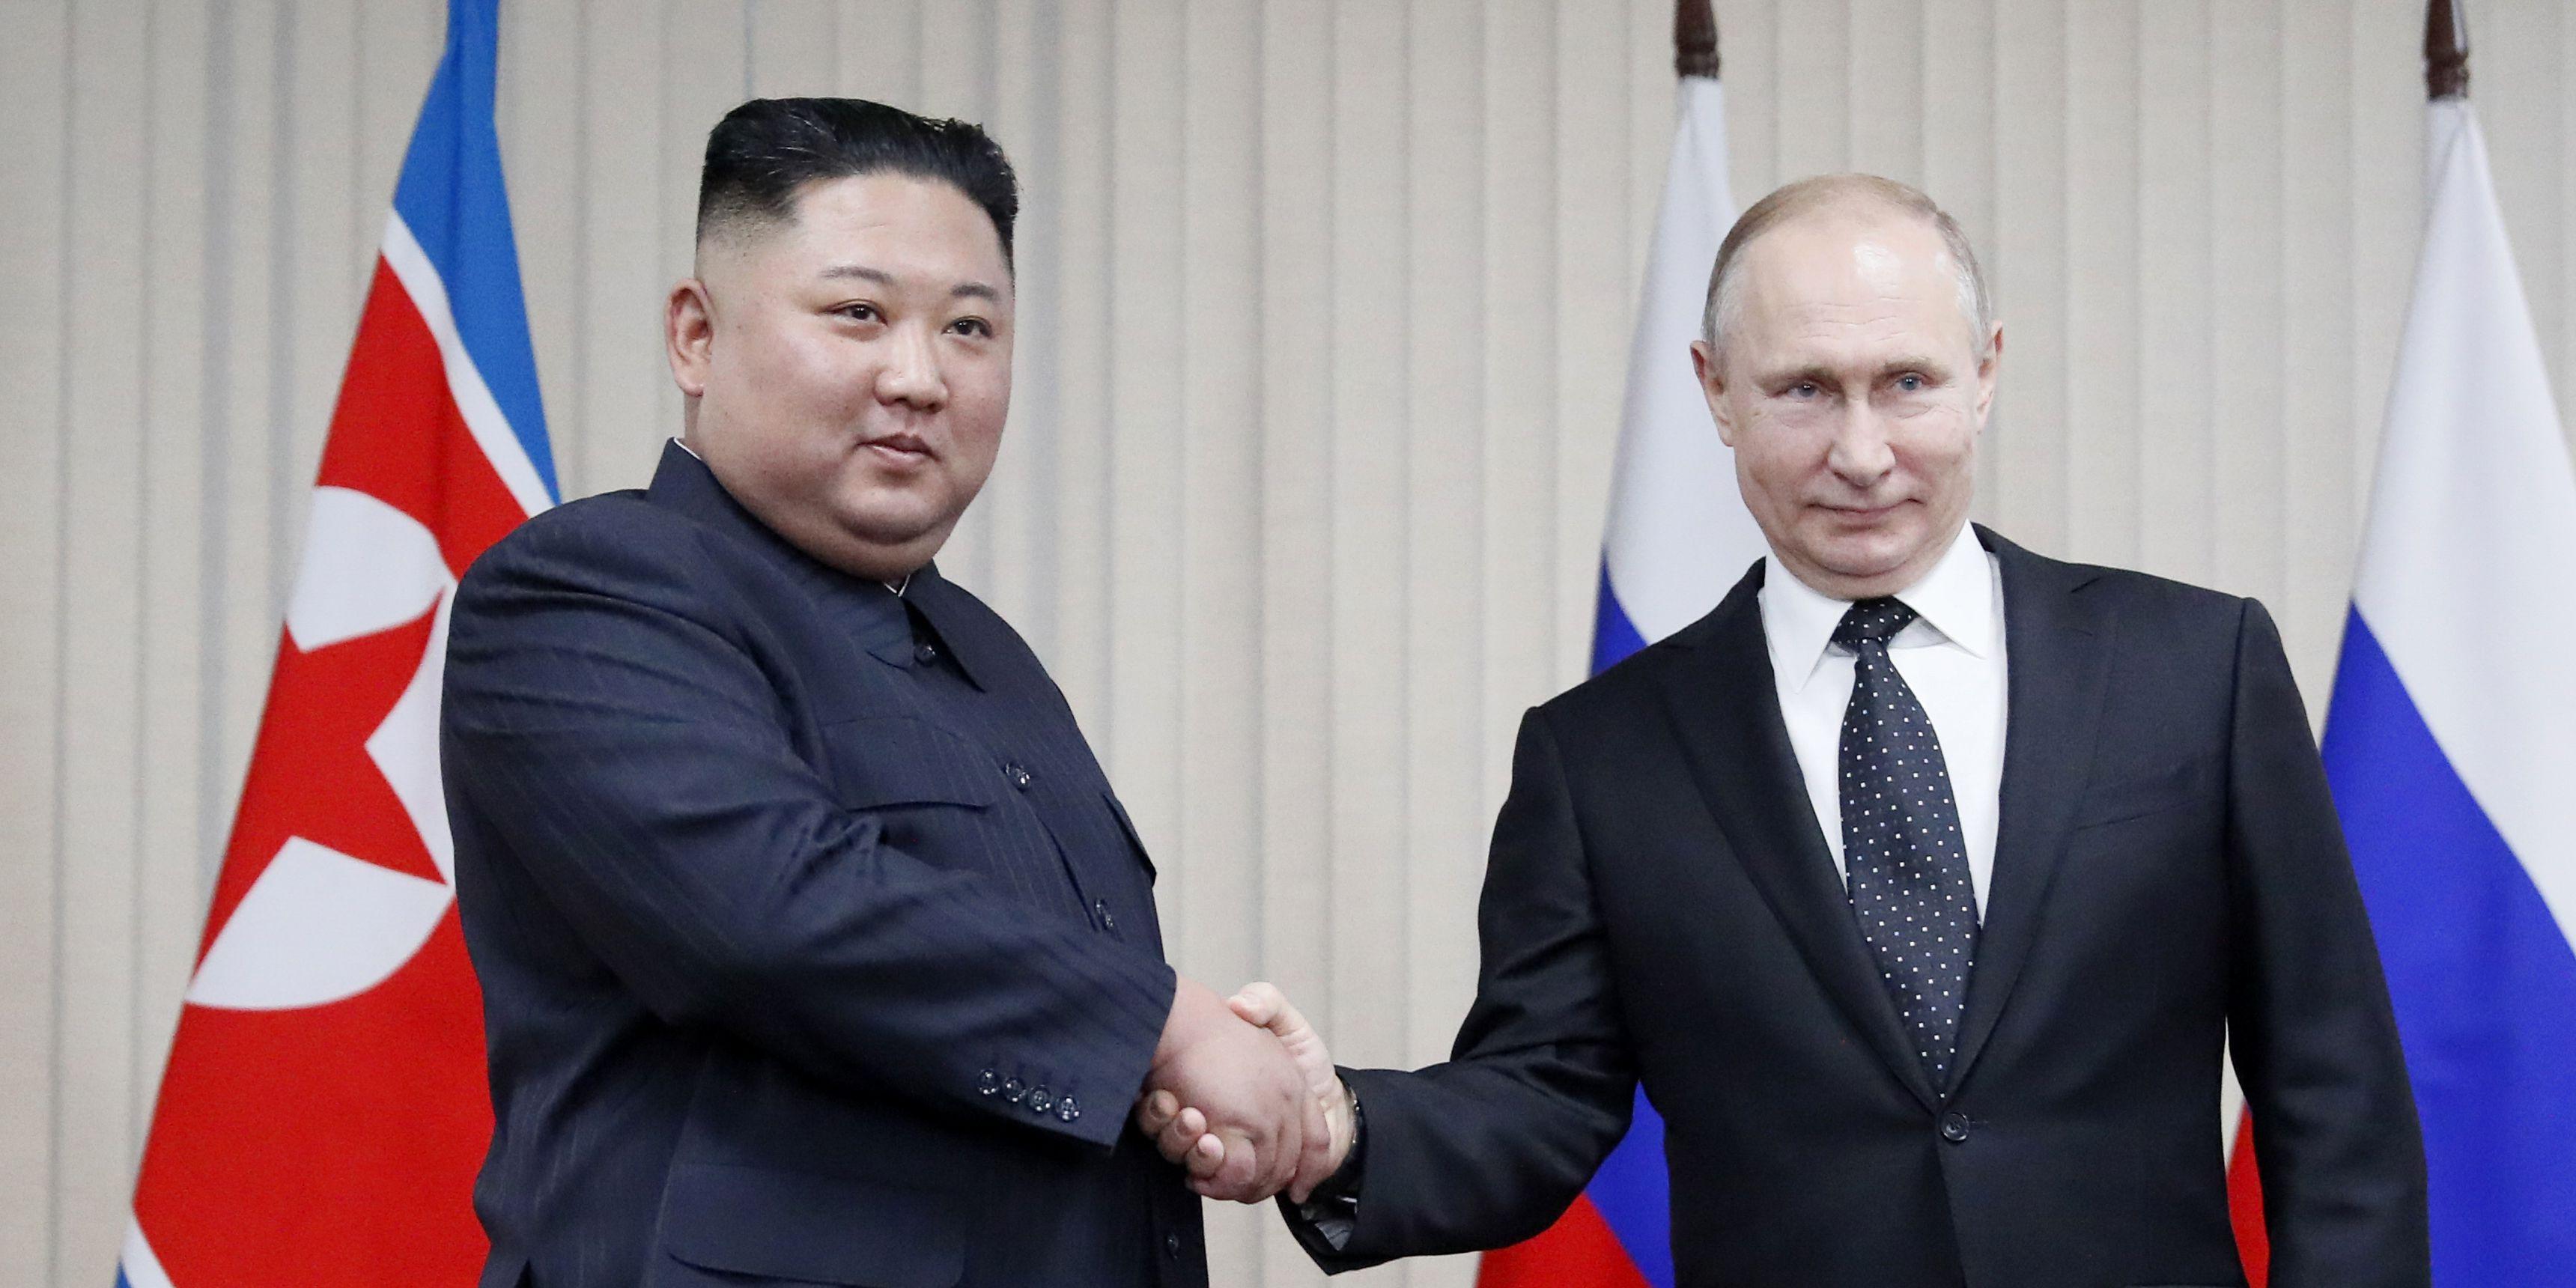 Putin, Kim discuss how to break North Korean nuclear standoff